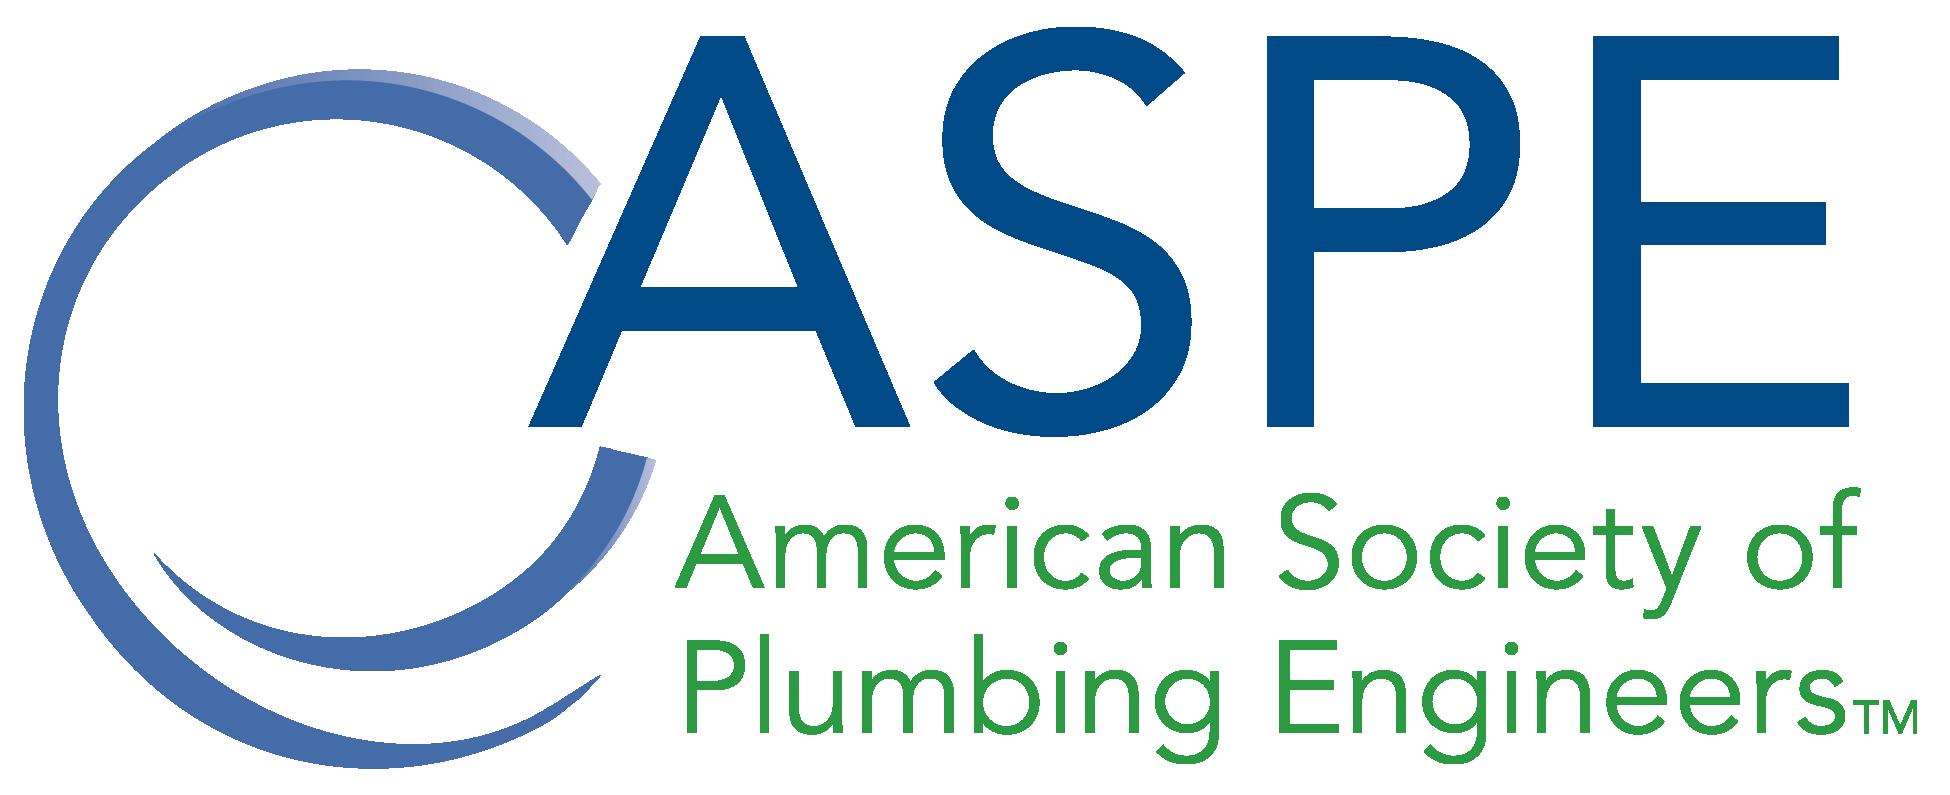 ASPE_logo@3x.png